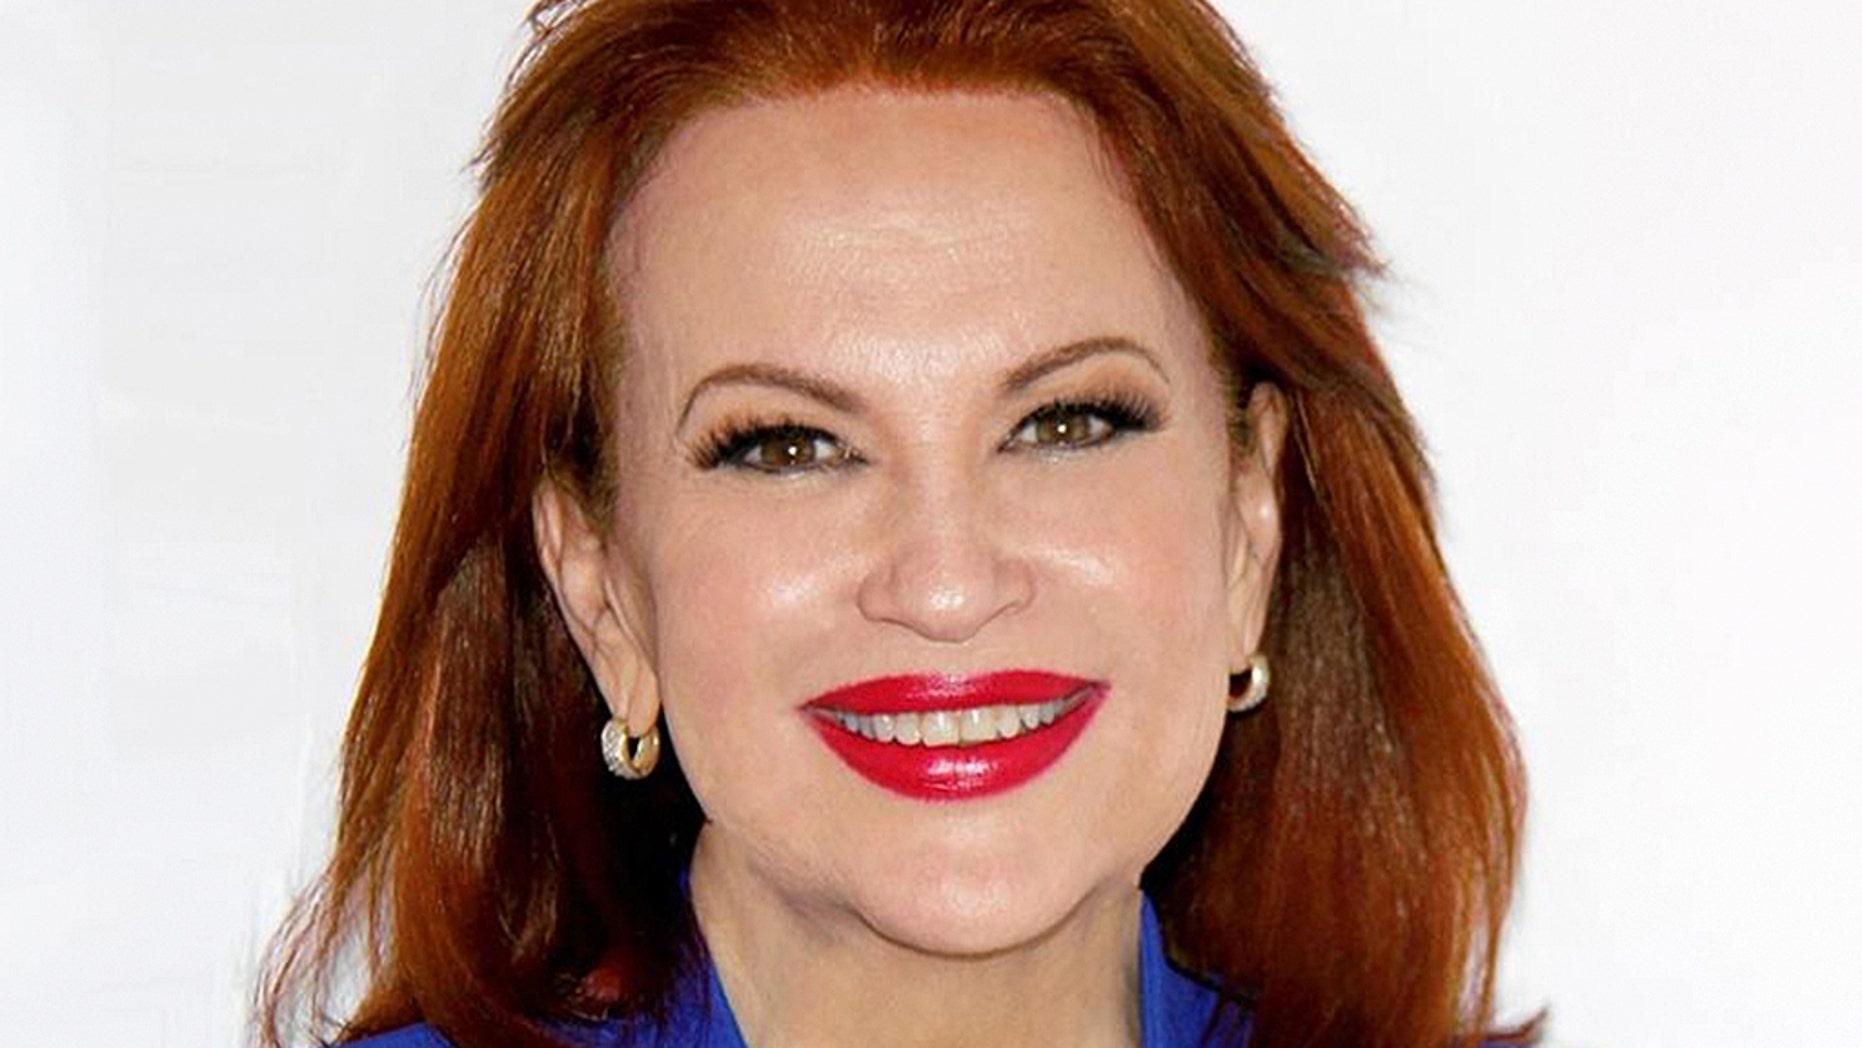 The Miami Herald has endorsed Bettina Rodriguez Aguilera, a Republican, for Congress.